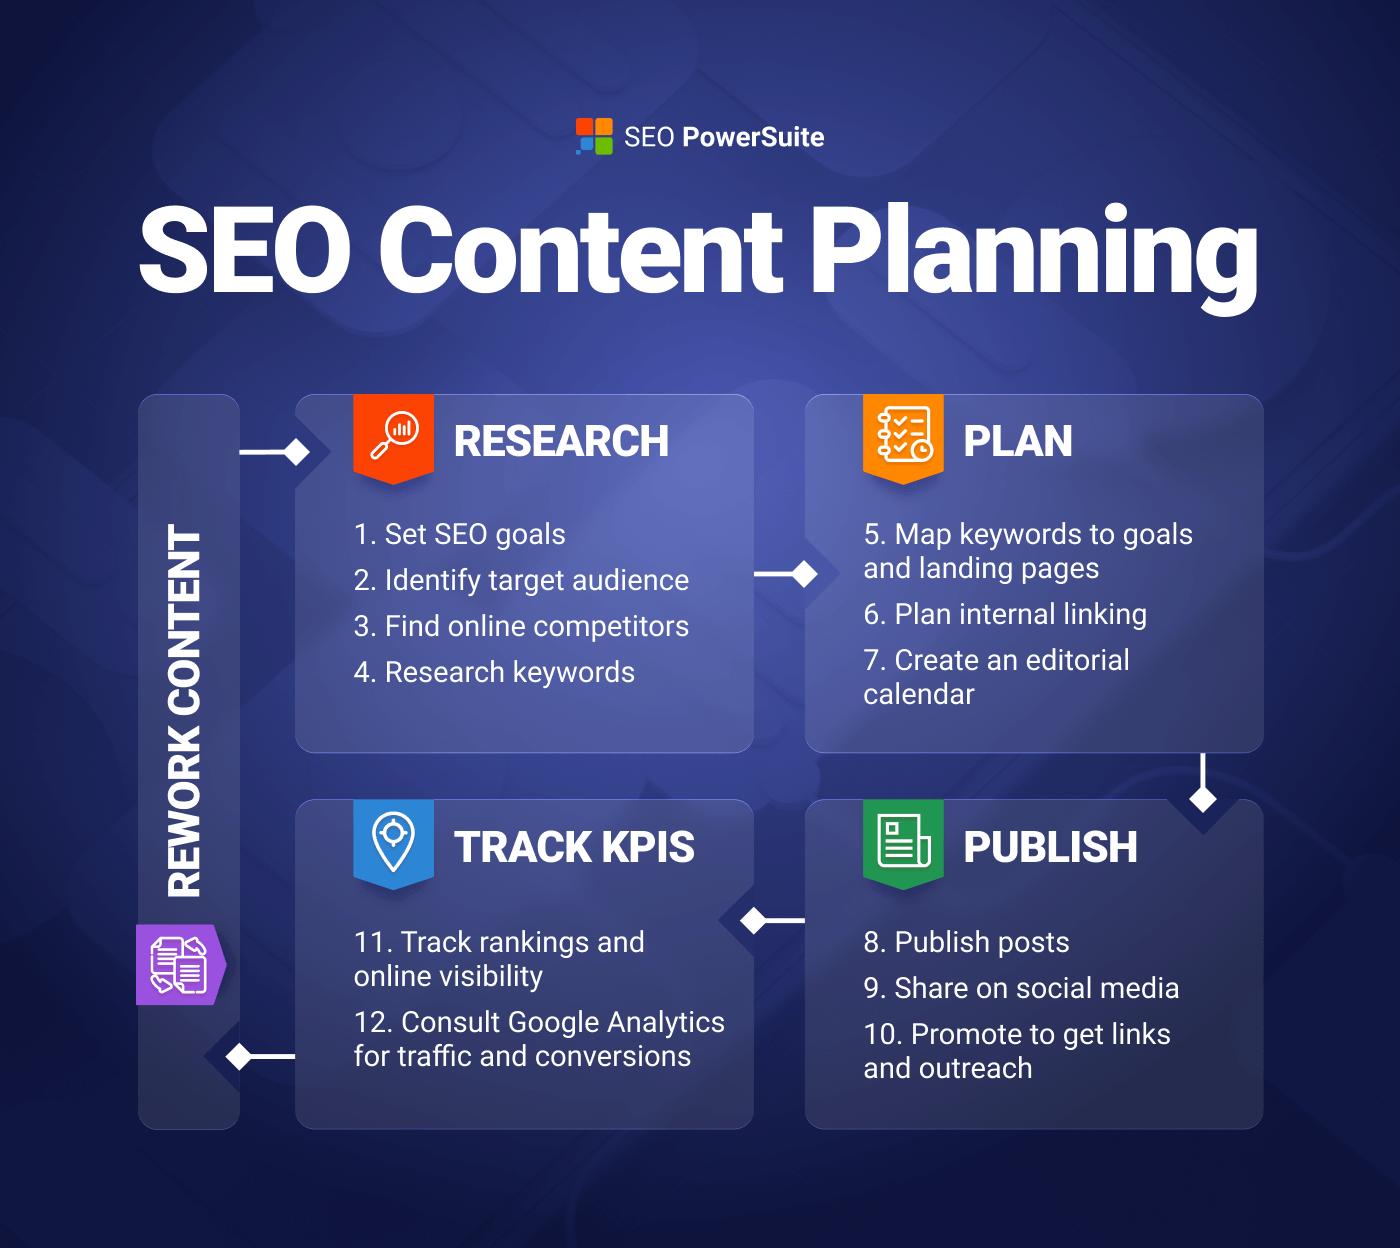 SEO Content Plan Infographic